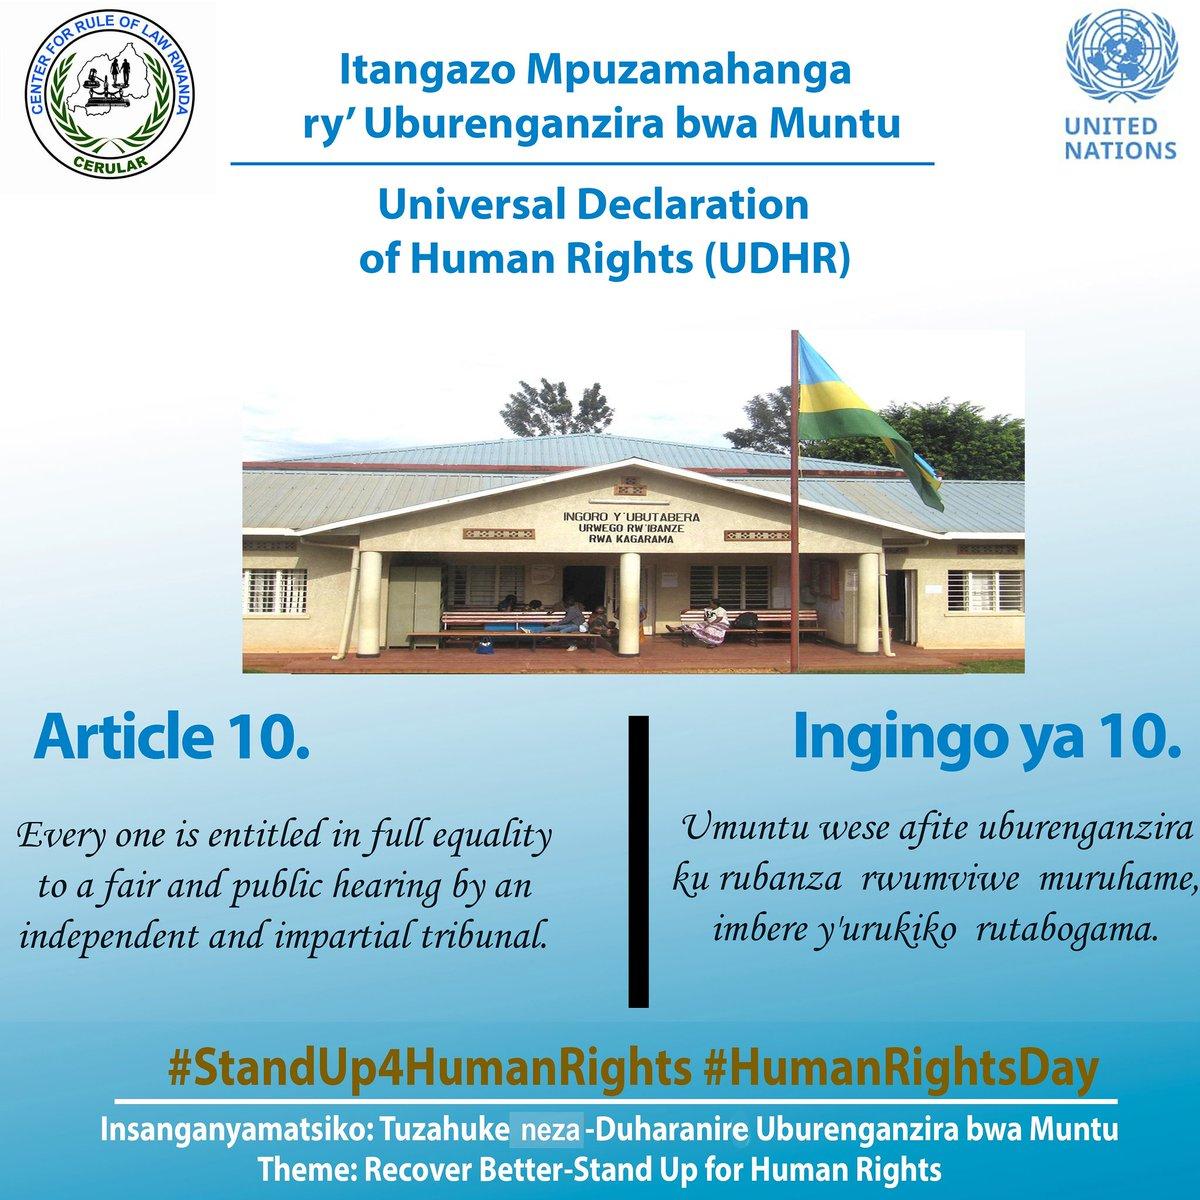 #UDHR72 Day 4. Article 10 and 11 of the Universal Declaration of Human Rights. @Rwanda_Justice @HumanRightsRW  @RwandaJudiciary @RwandaGender @RIB_Rw  @BusingyeJohns  @UNRwanda @UNDP_Rwanda   @NLinRwanda @LegalAid_Rwanda @InterpeaceTweet @AJijukirwa  #RwOT   #HumanRightsDay2020